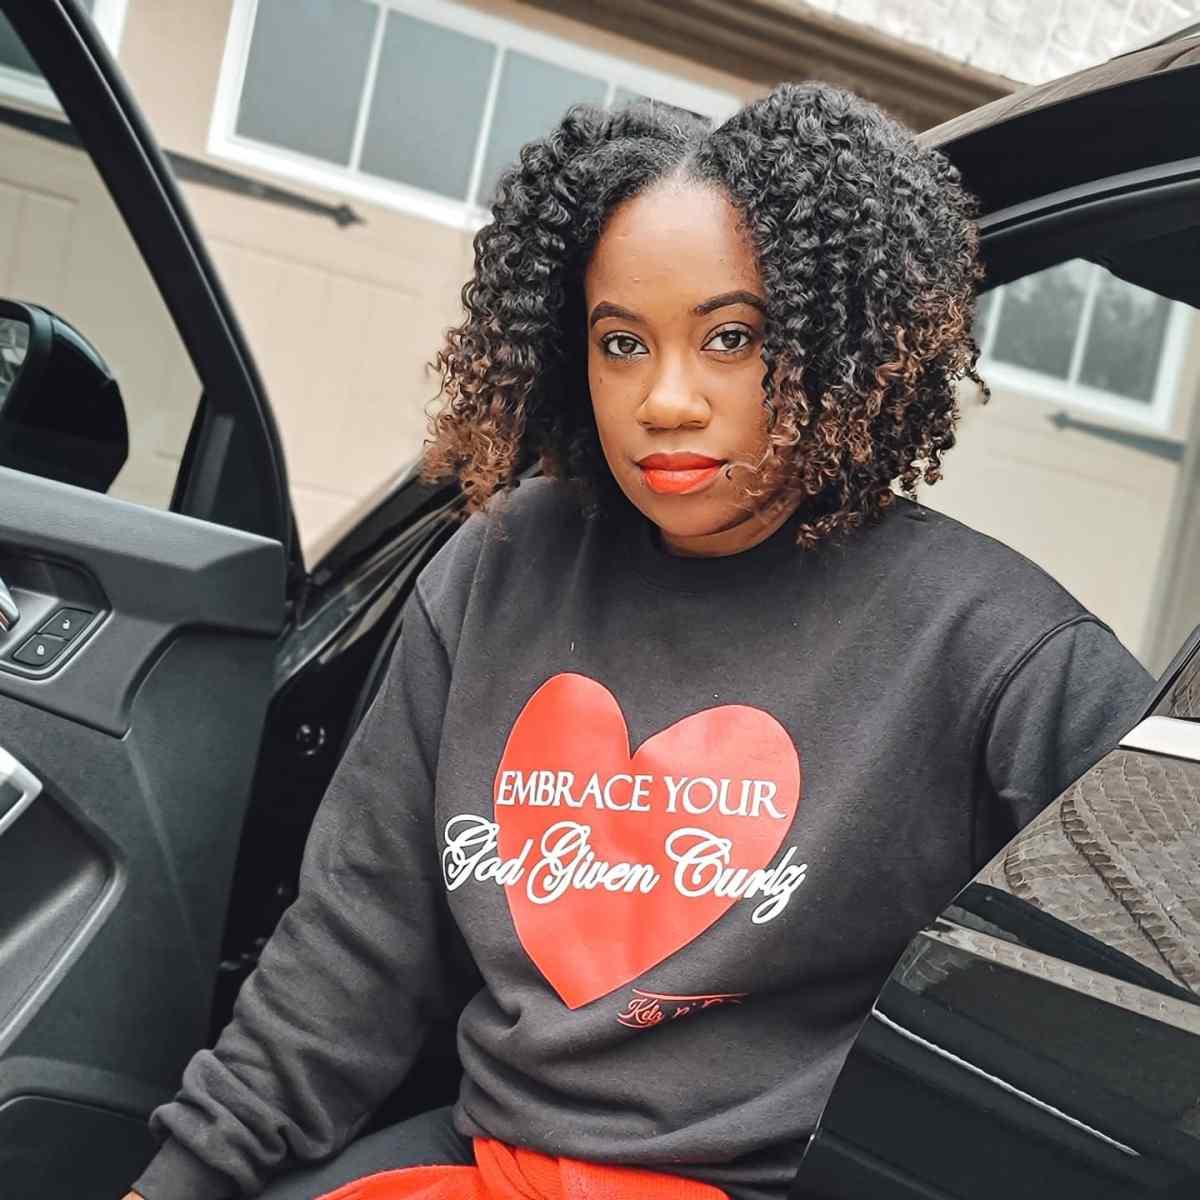 Embrace Your God Given Curlz Crewneck Sweatshirt (Black)